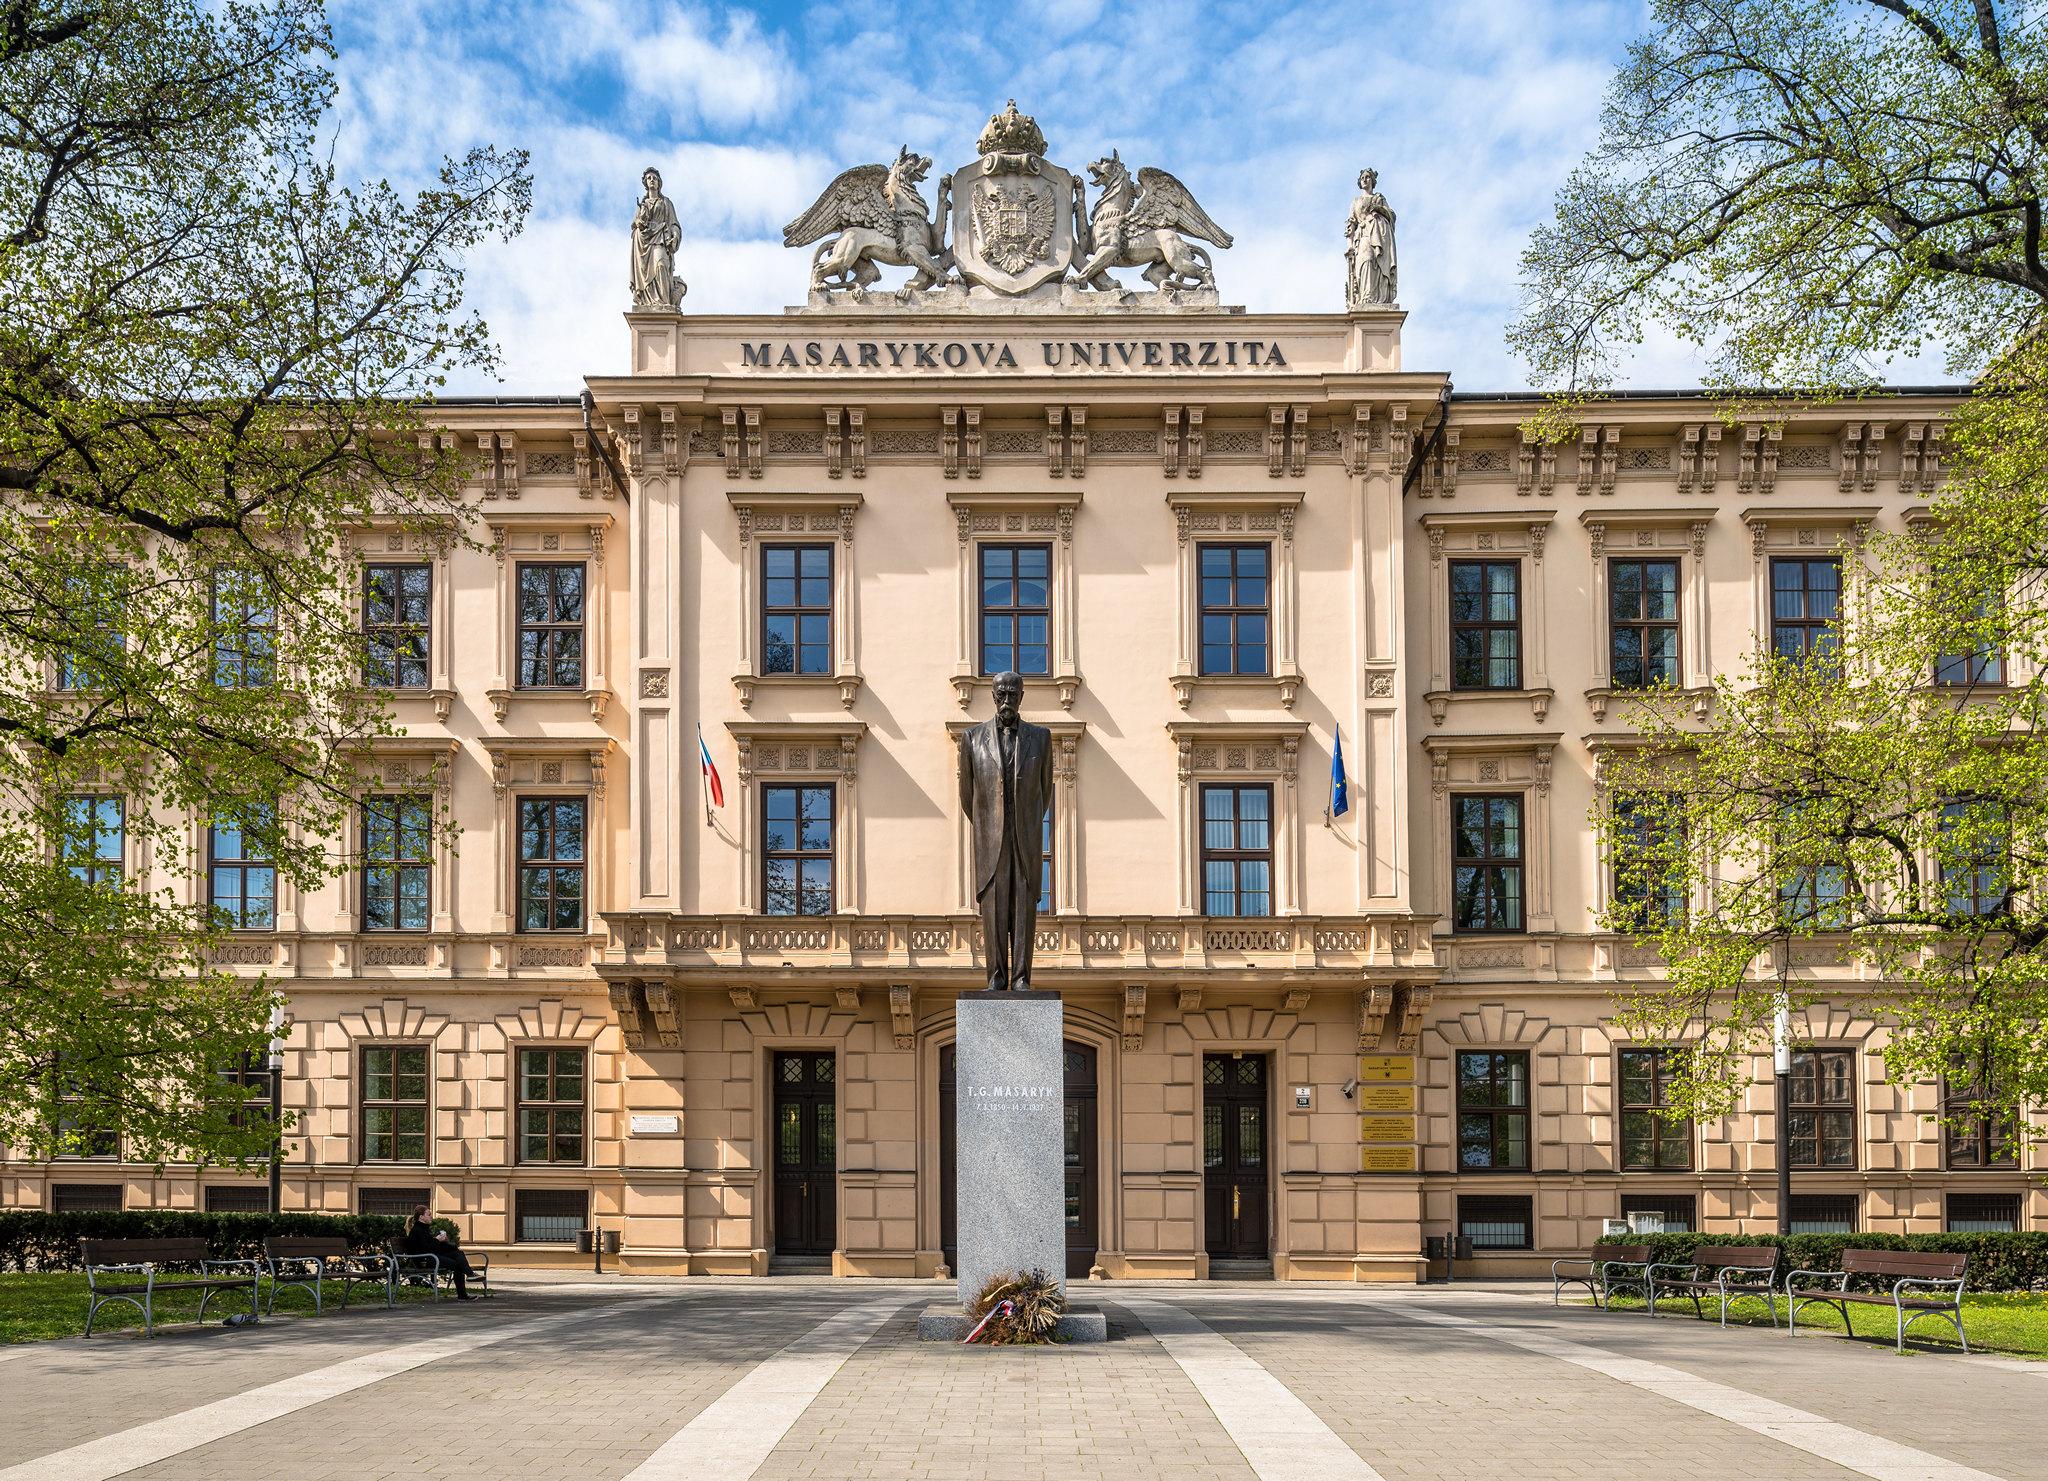 Masaryk University building in Brno